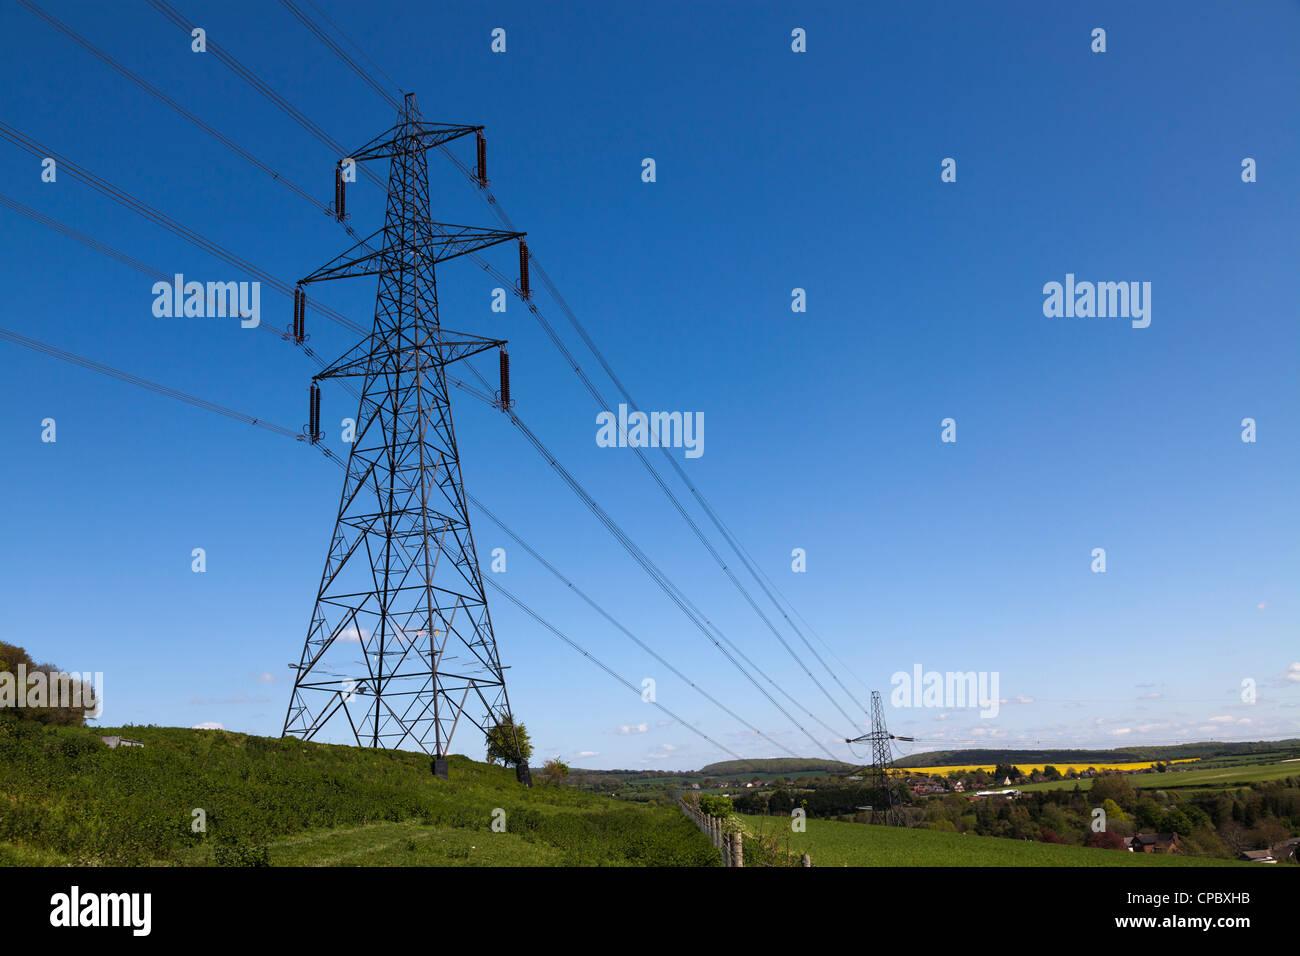 Electricity pylon against deep blue sky - Stock Image